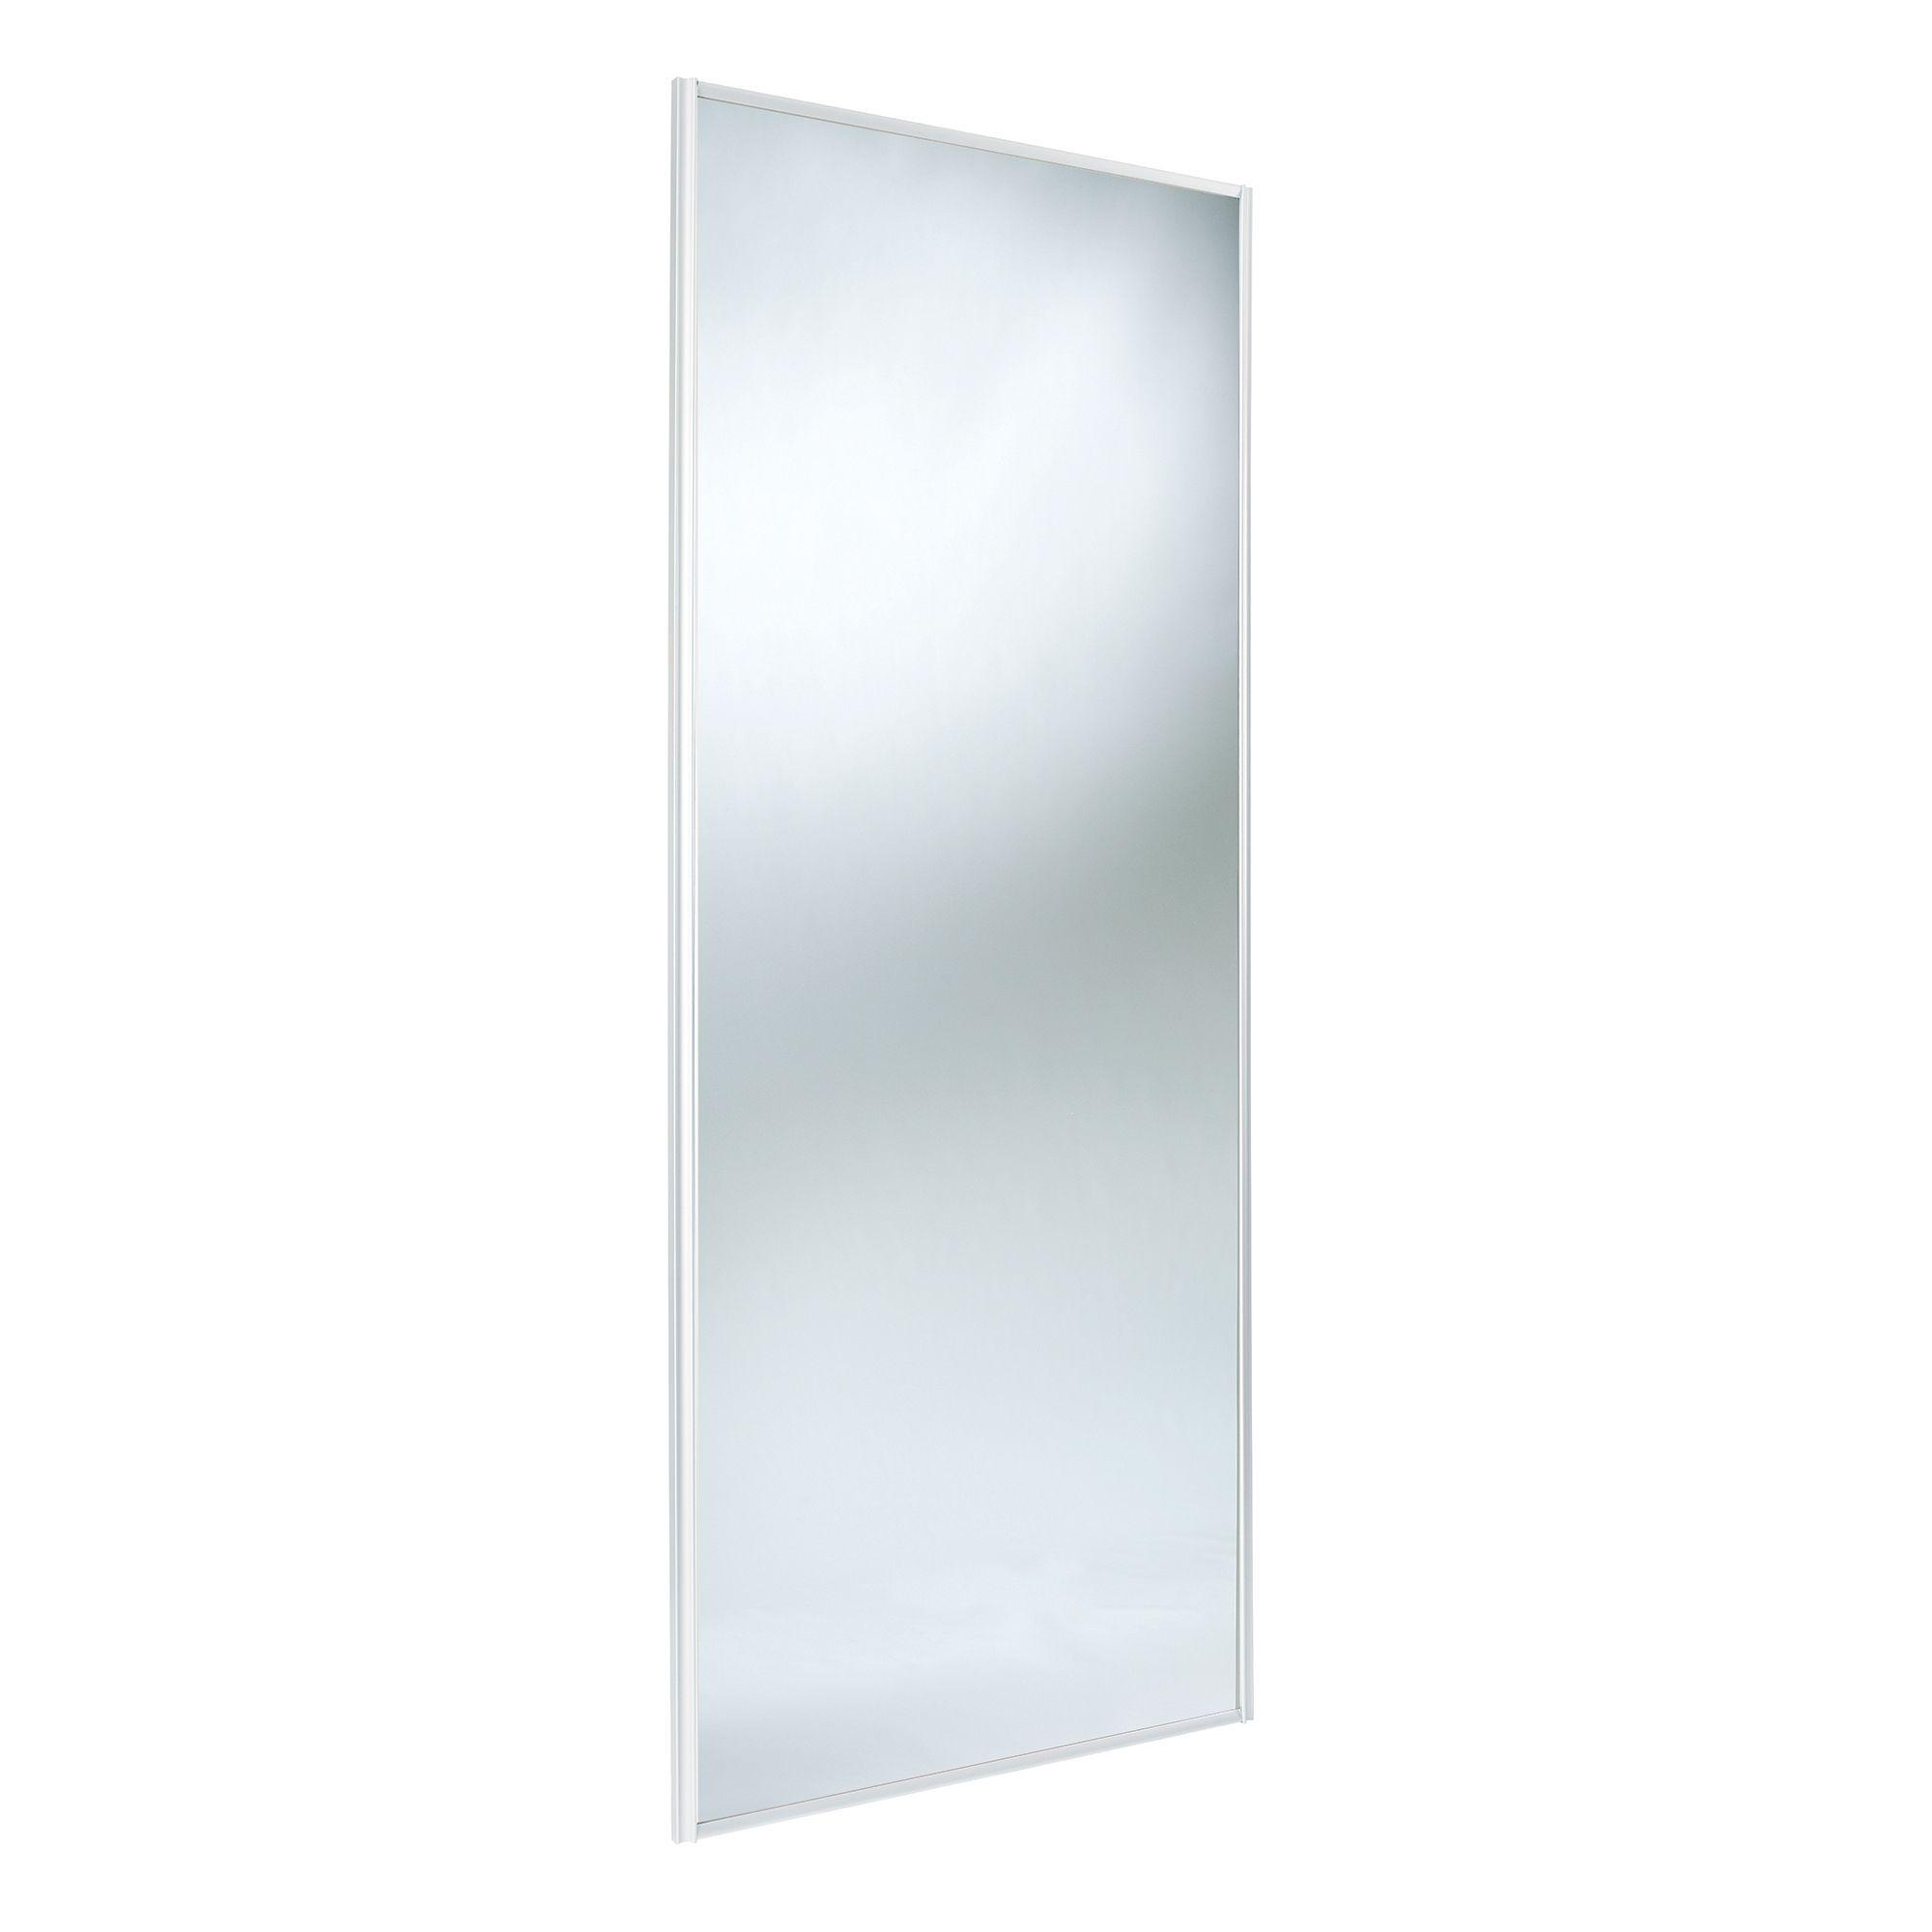 Classic Full Length Mirror White Mirror Effect Sliding Wardrobe Door (h)2220 Mm (w)762 Mm